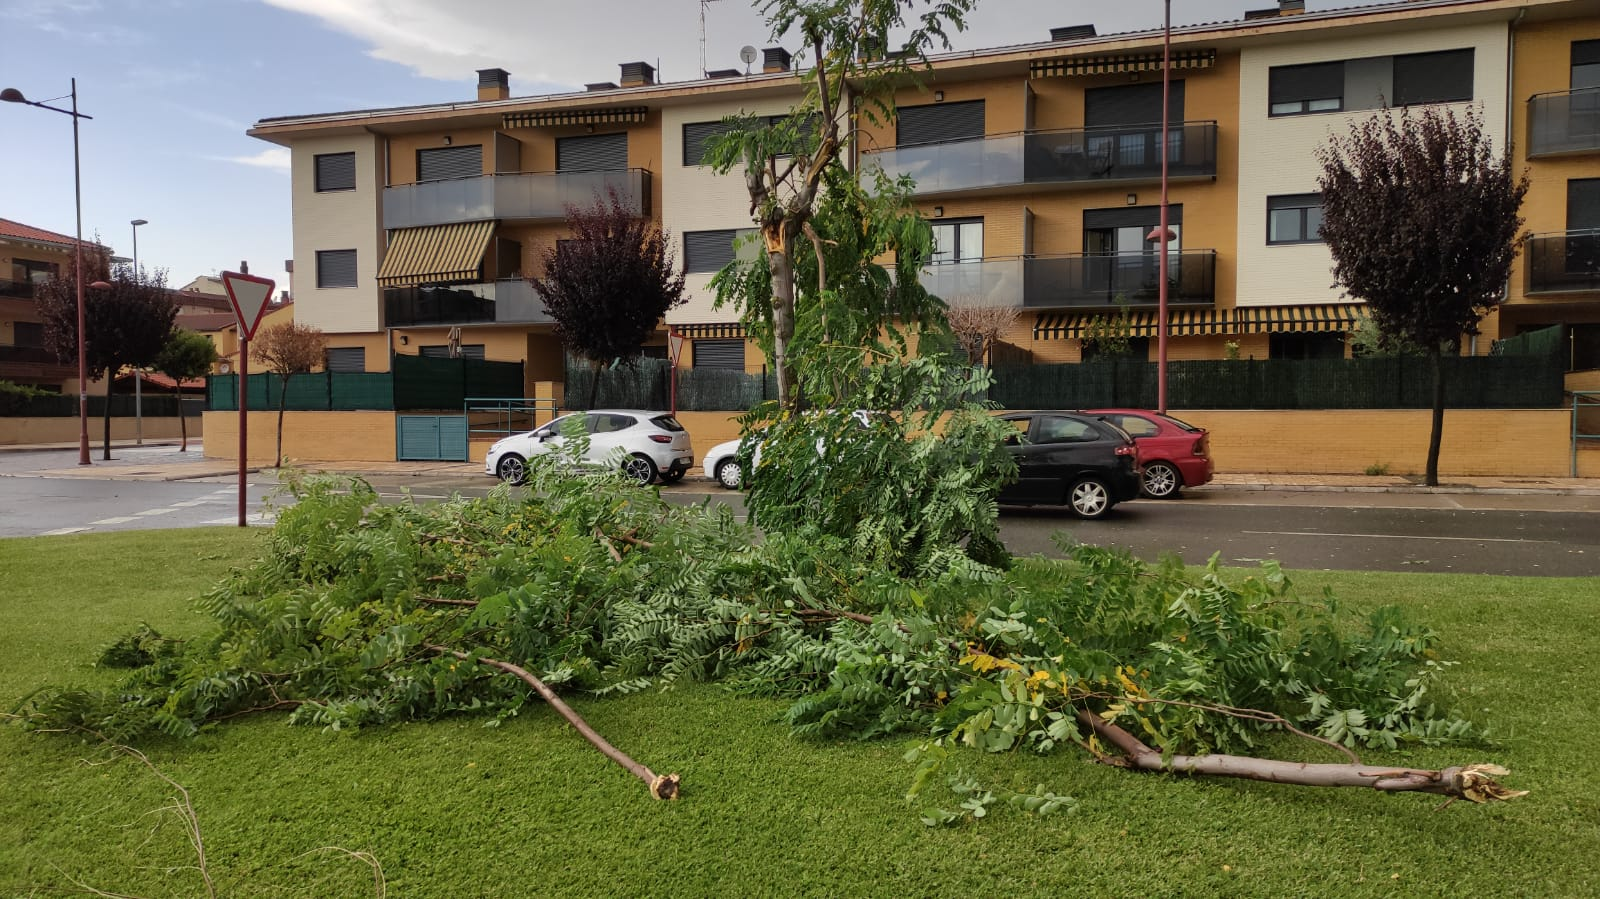 árboles rotos